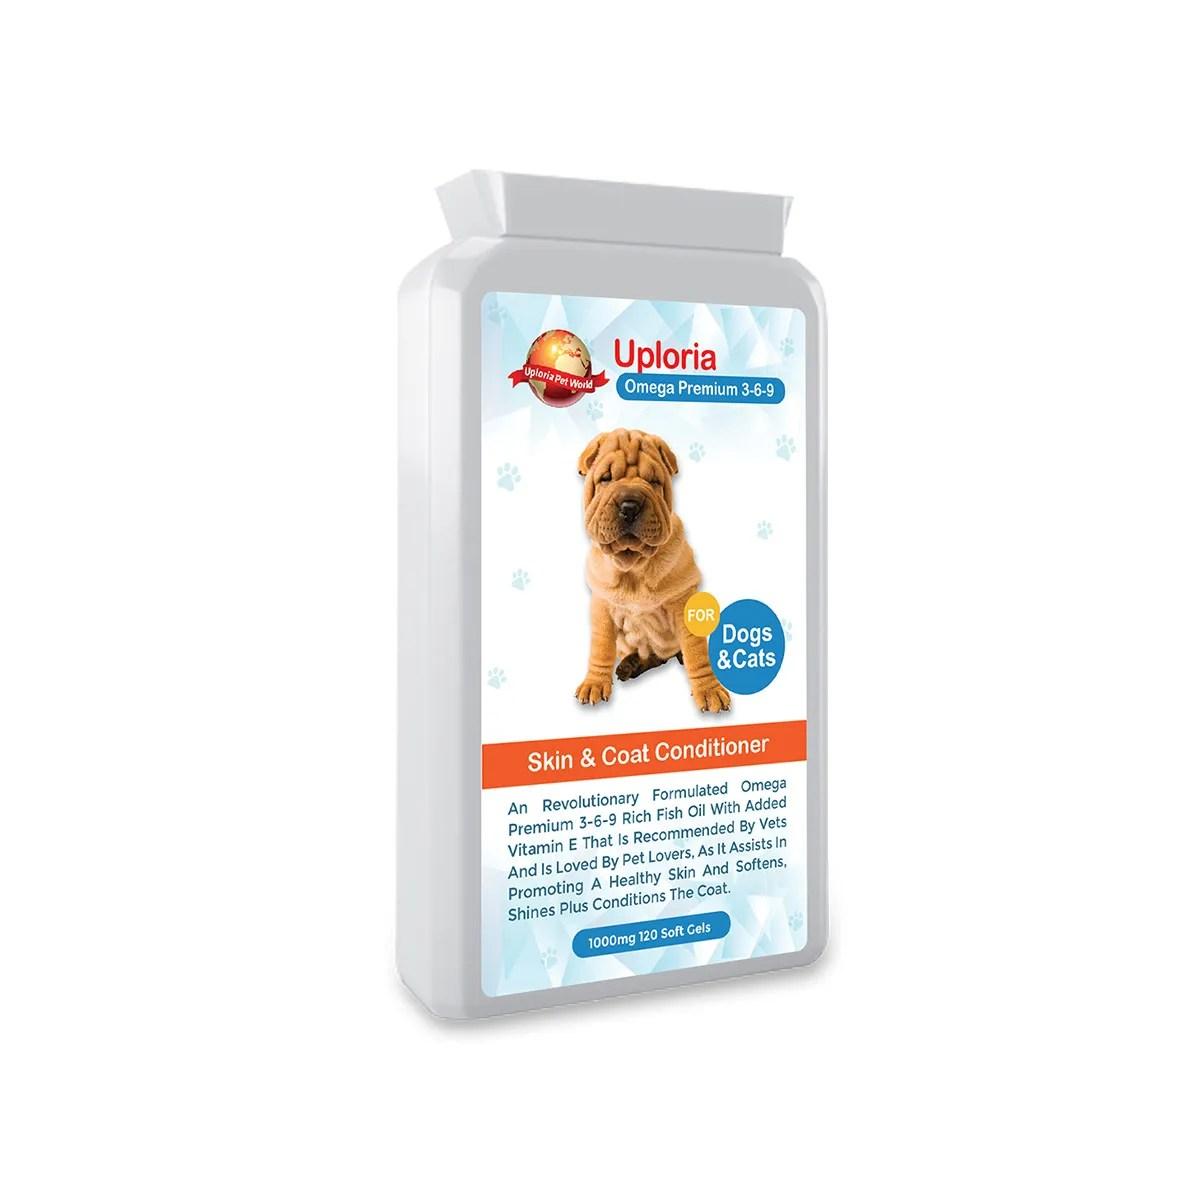 Omega oil capsules for Dogs